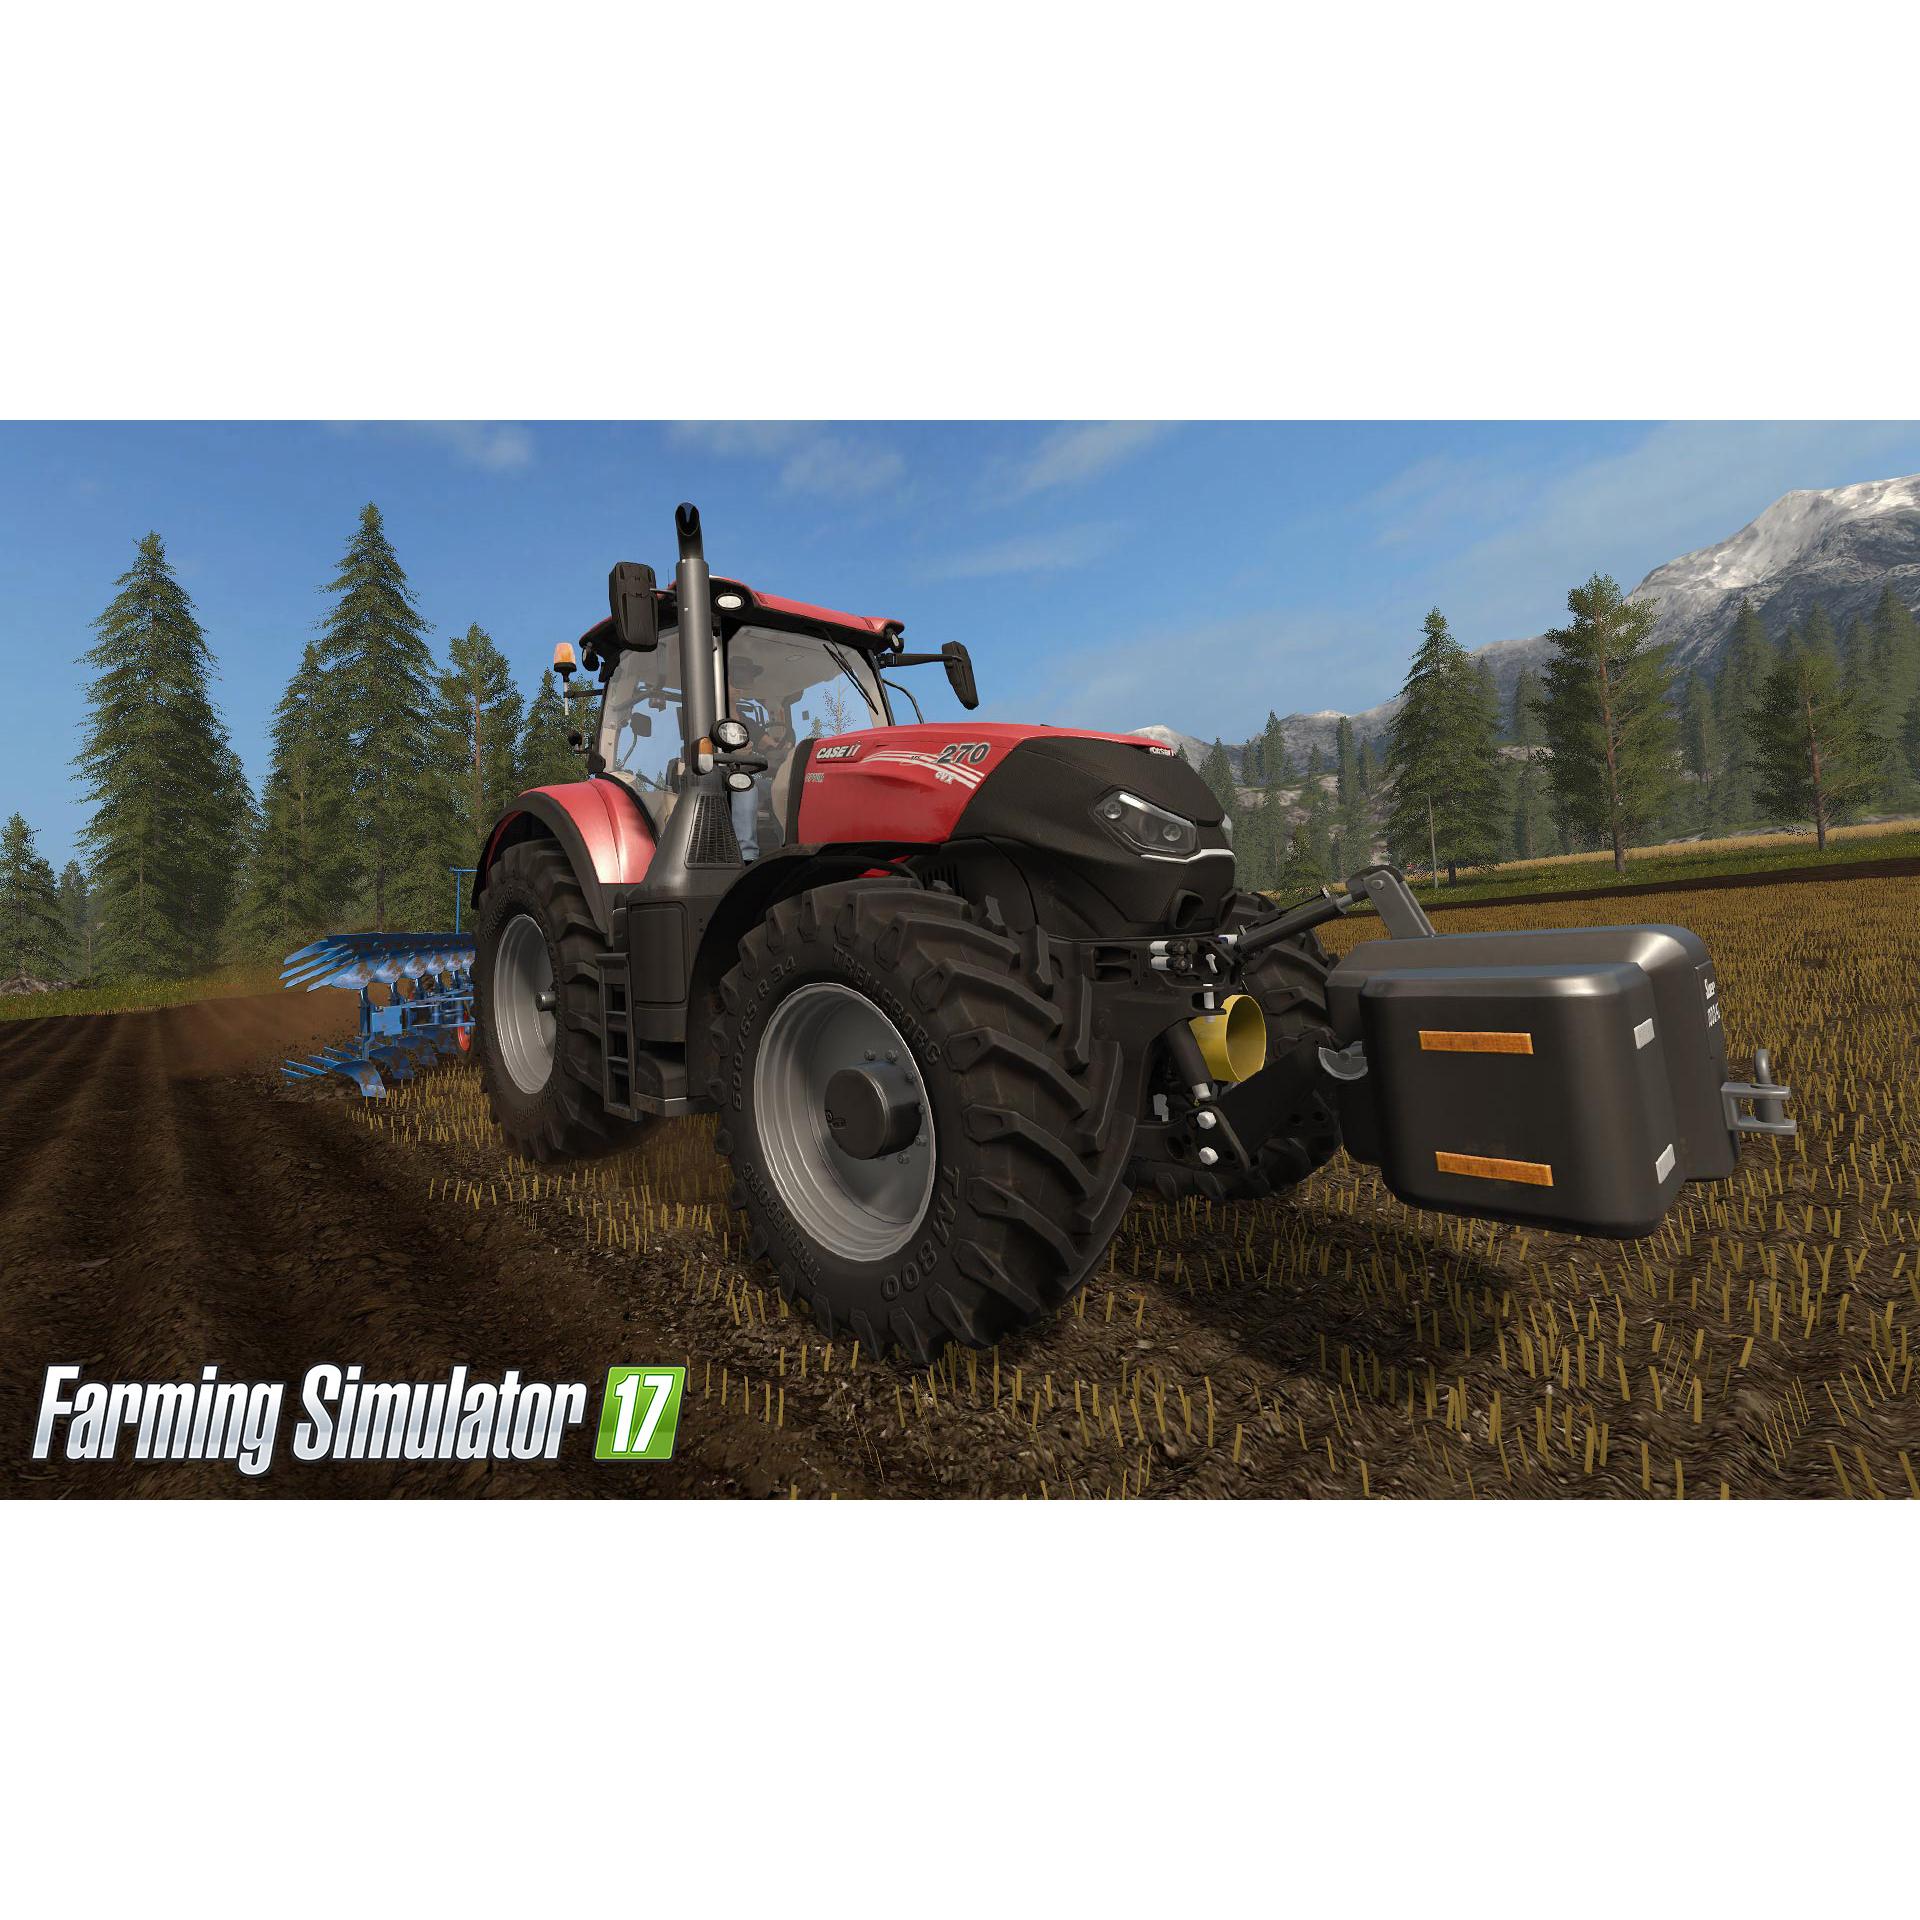 Farming simulator 17 Platinum edition, Xbox One 2